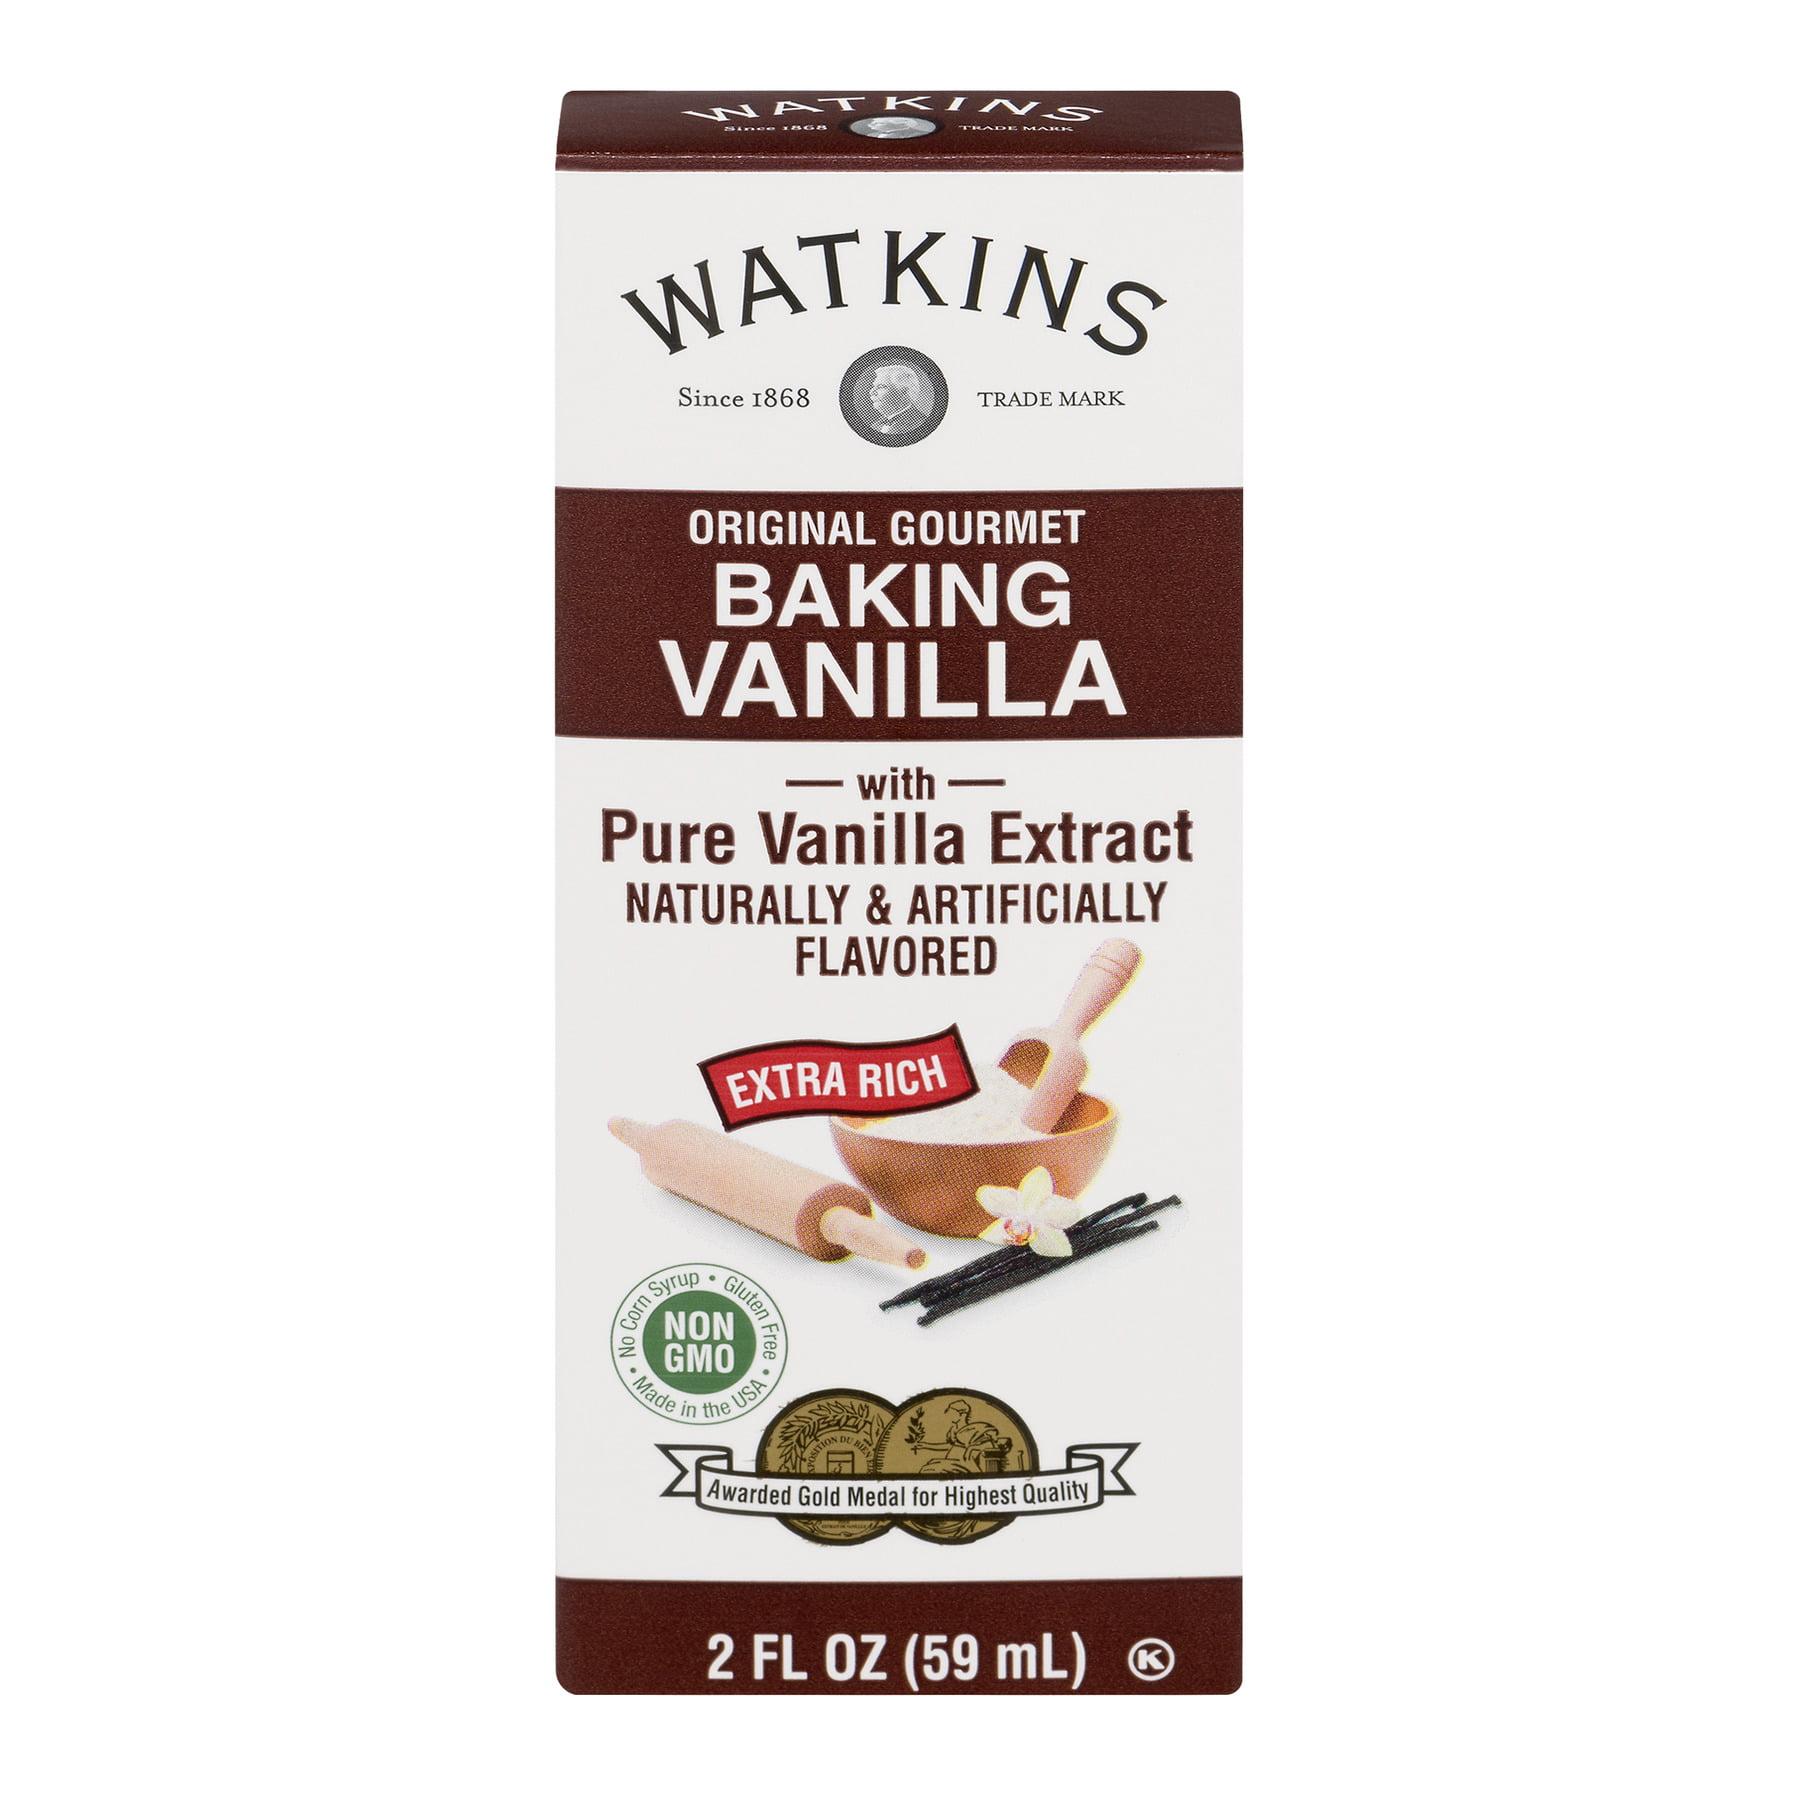 Watkins Baking Vanilla, 2 fl oz